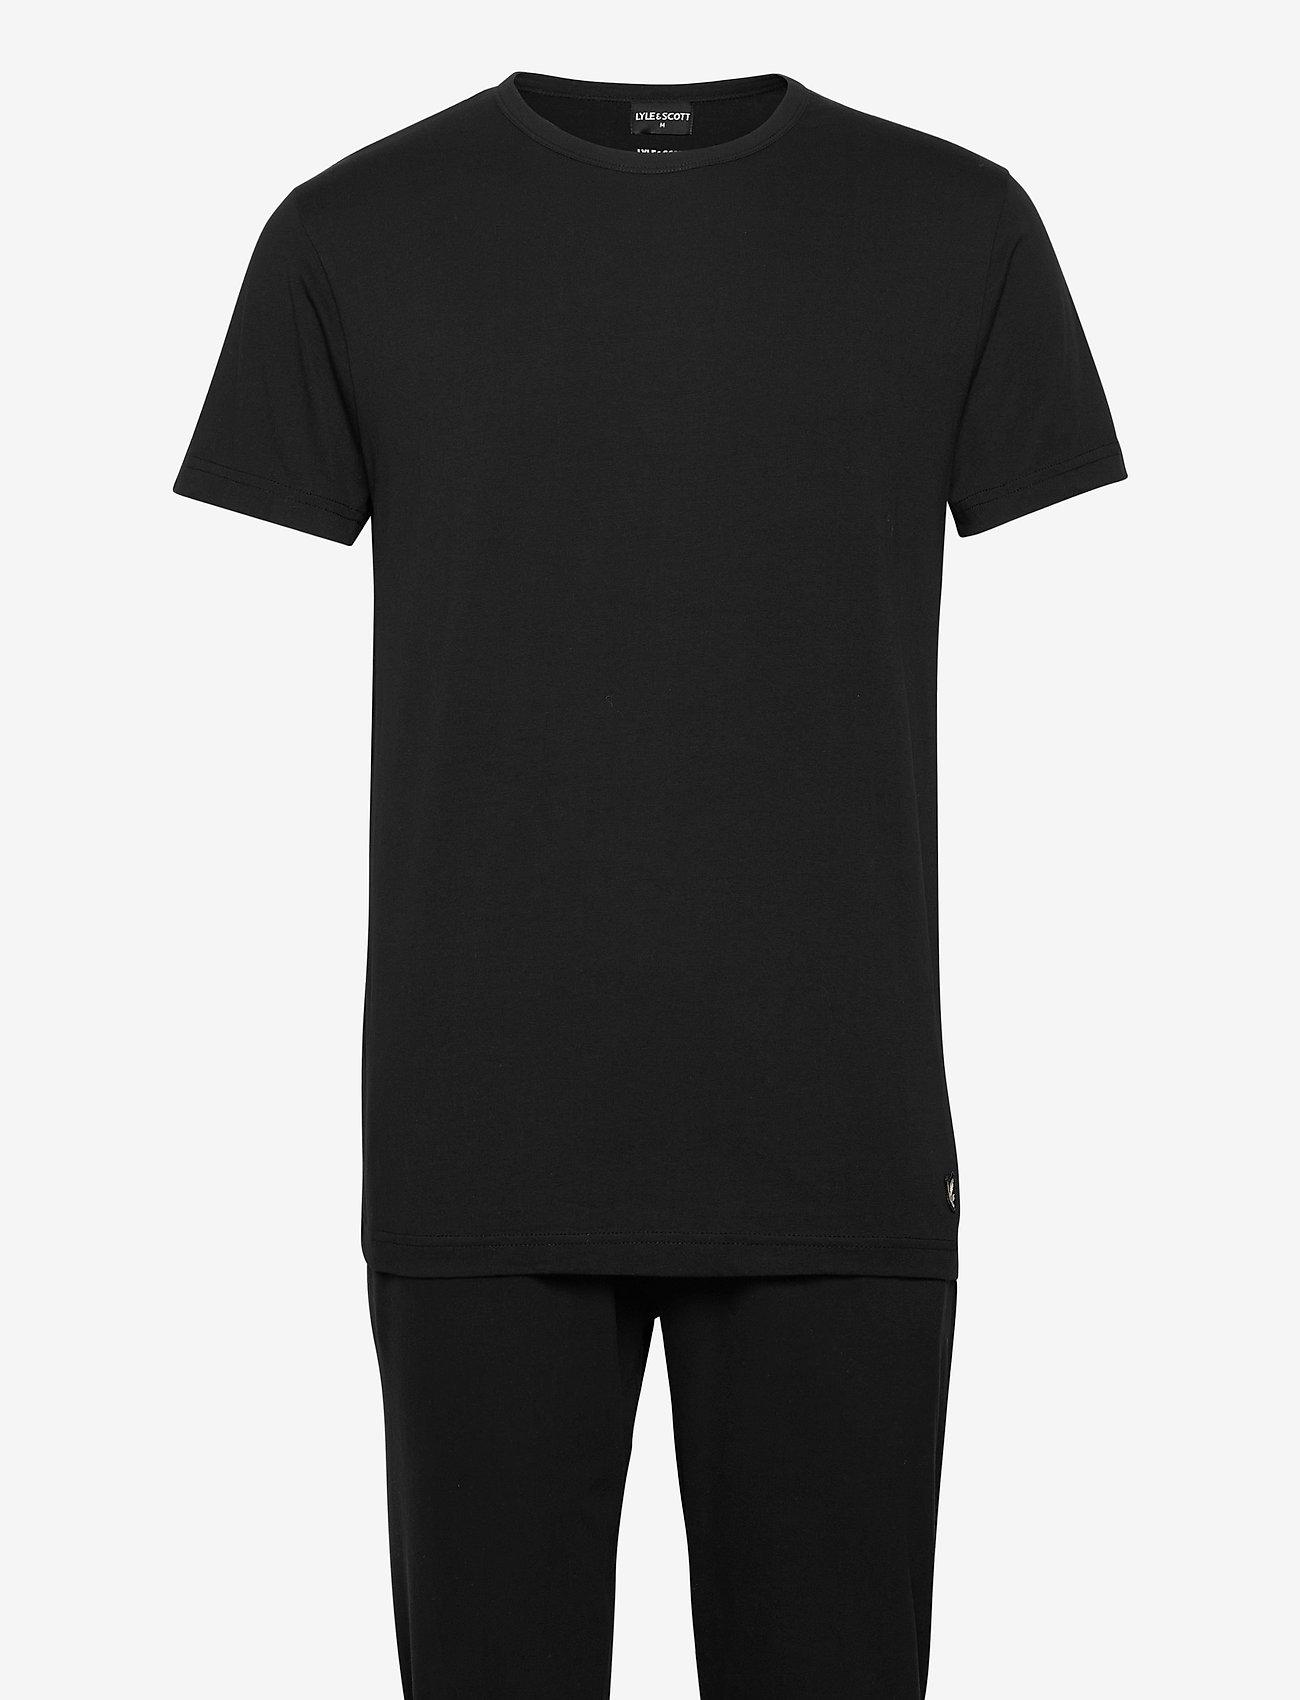 Lyle & Scott - BENJAMIN - pyjamas - black - 0